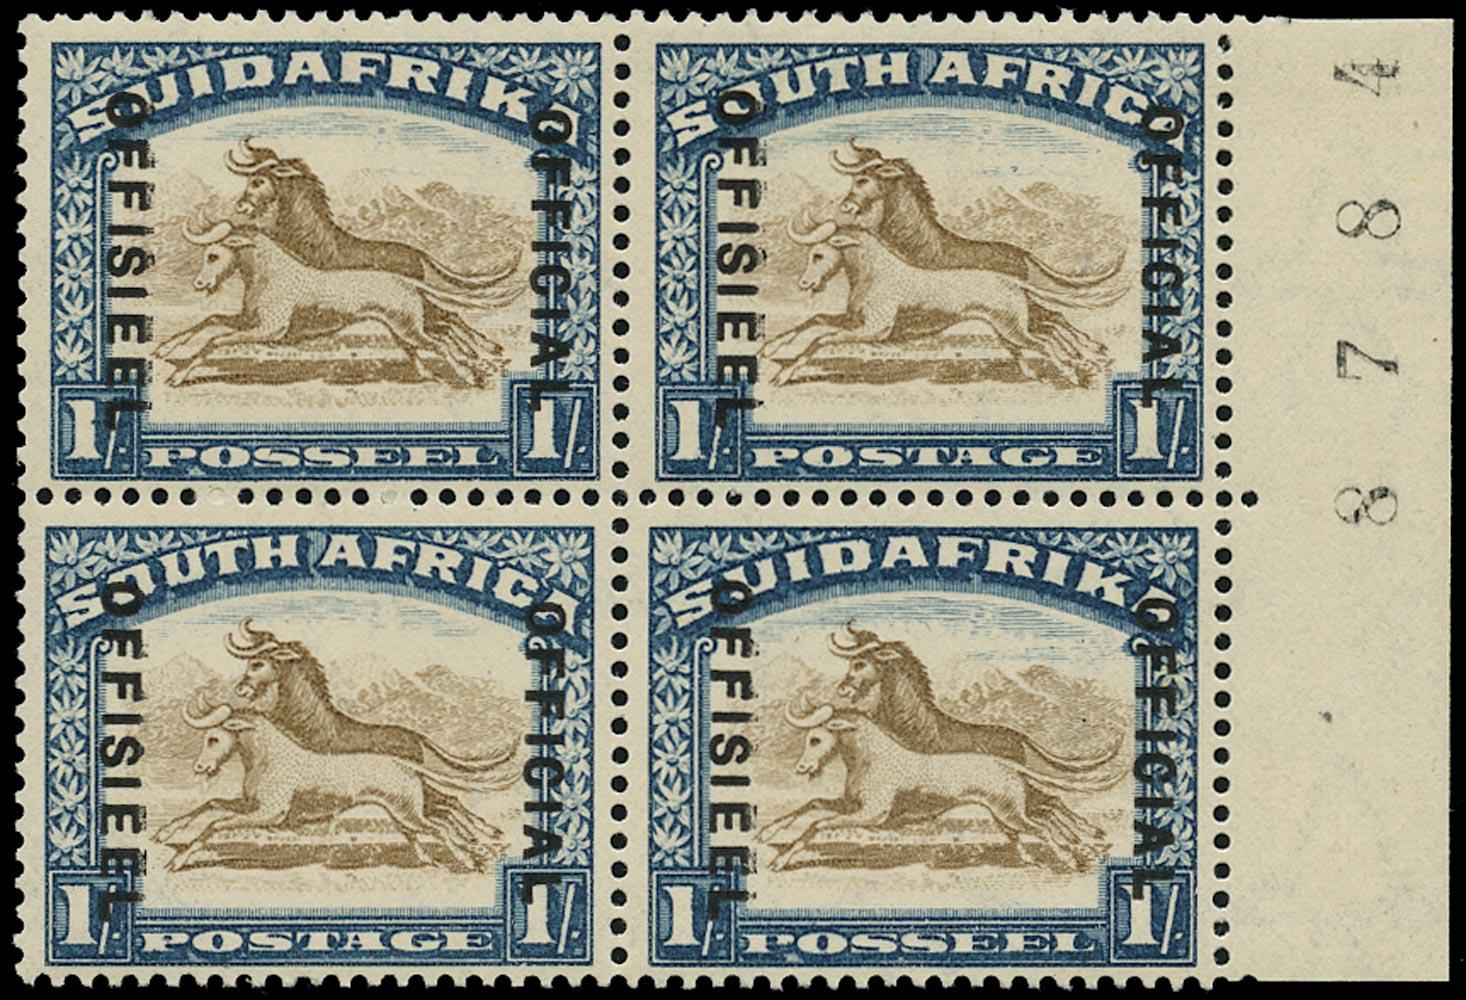 SOUTH AFRICA 1930  SGO17 Official